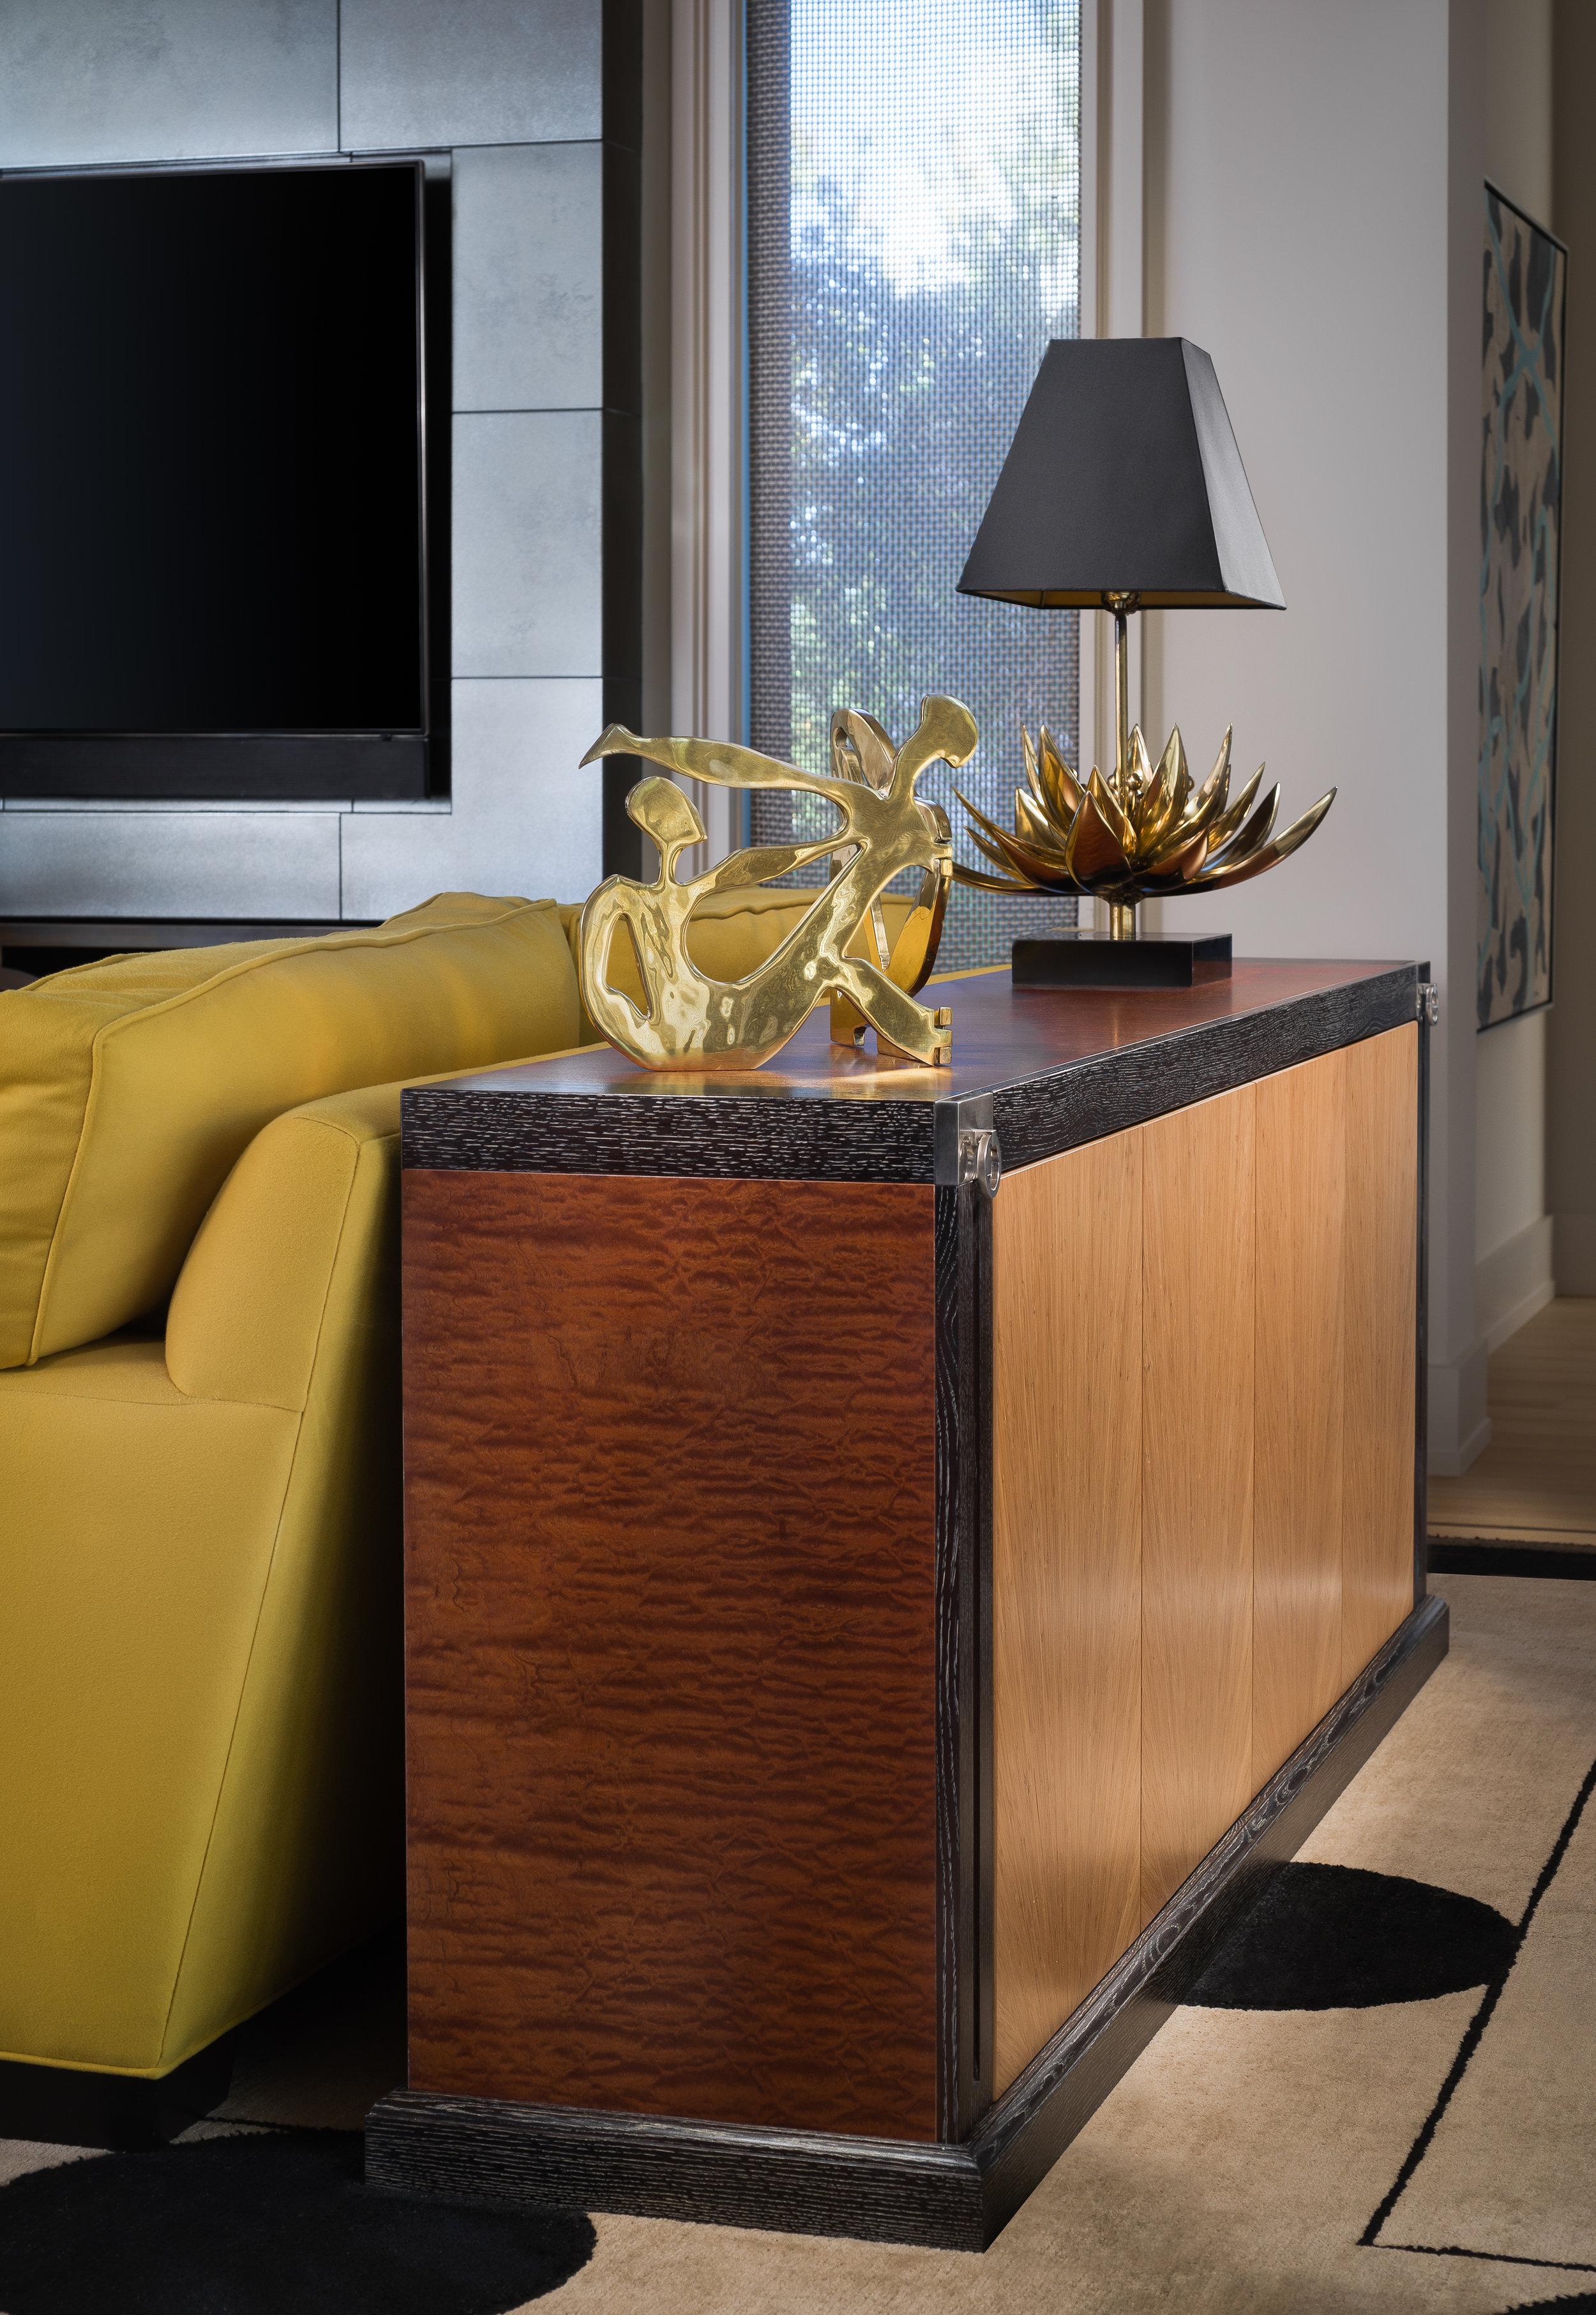 Second Credenza in Livingroom